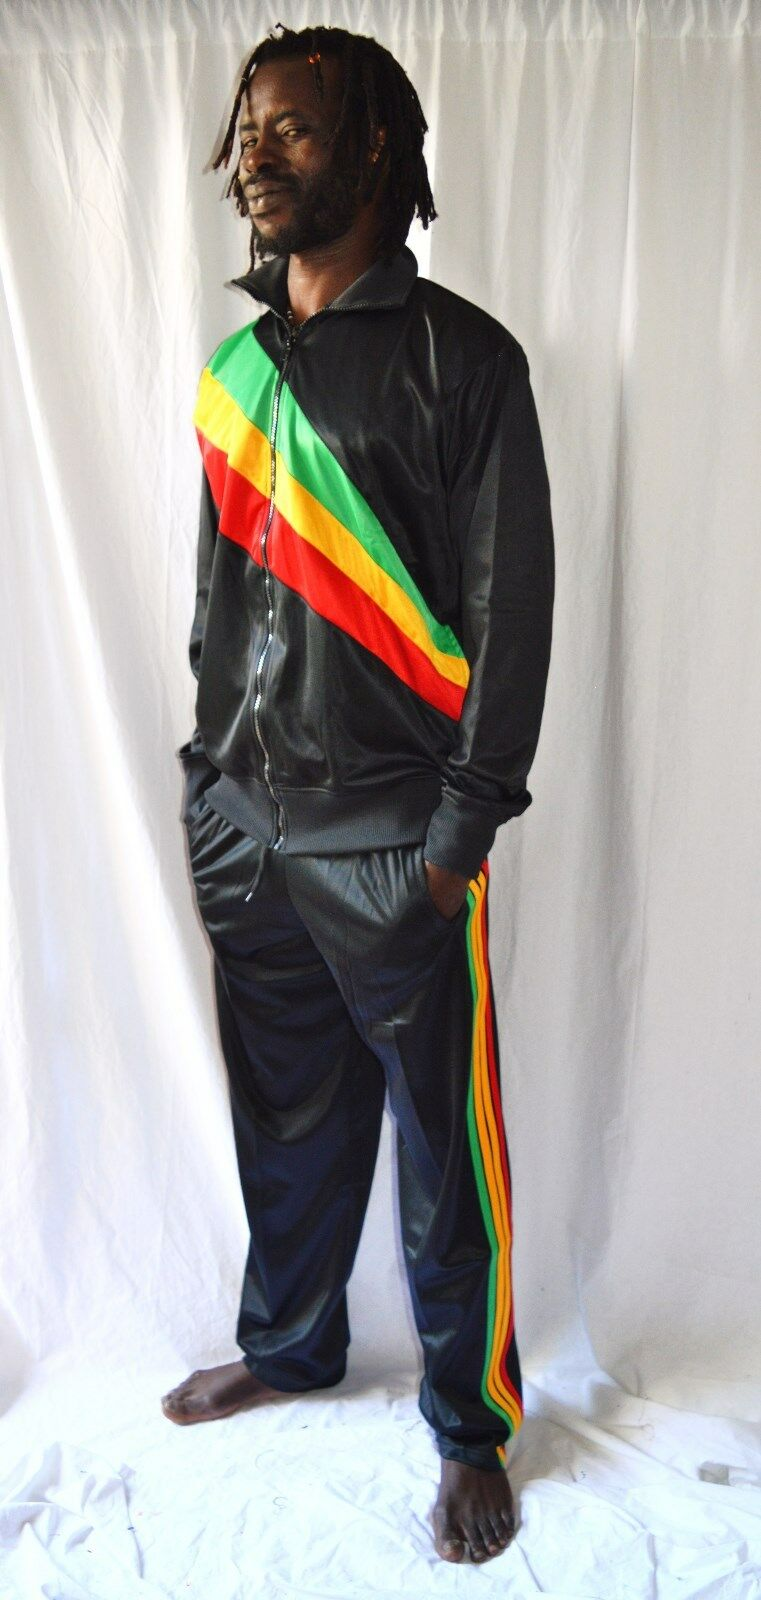 Rasta Jogging Anzug_Trainingsanzug_Jacke + Hose_Trainer_Reggae